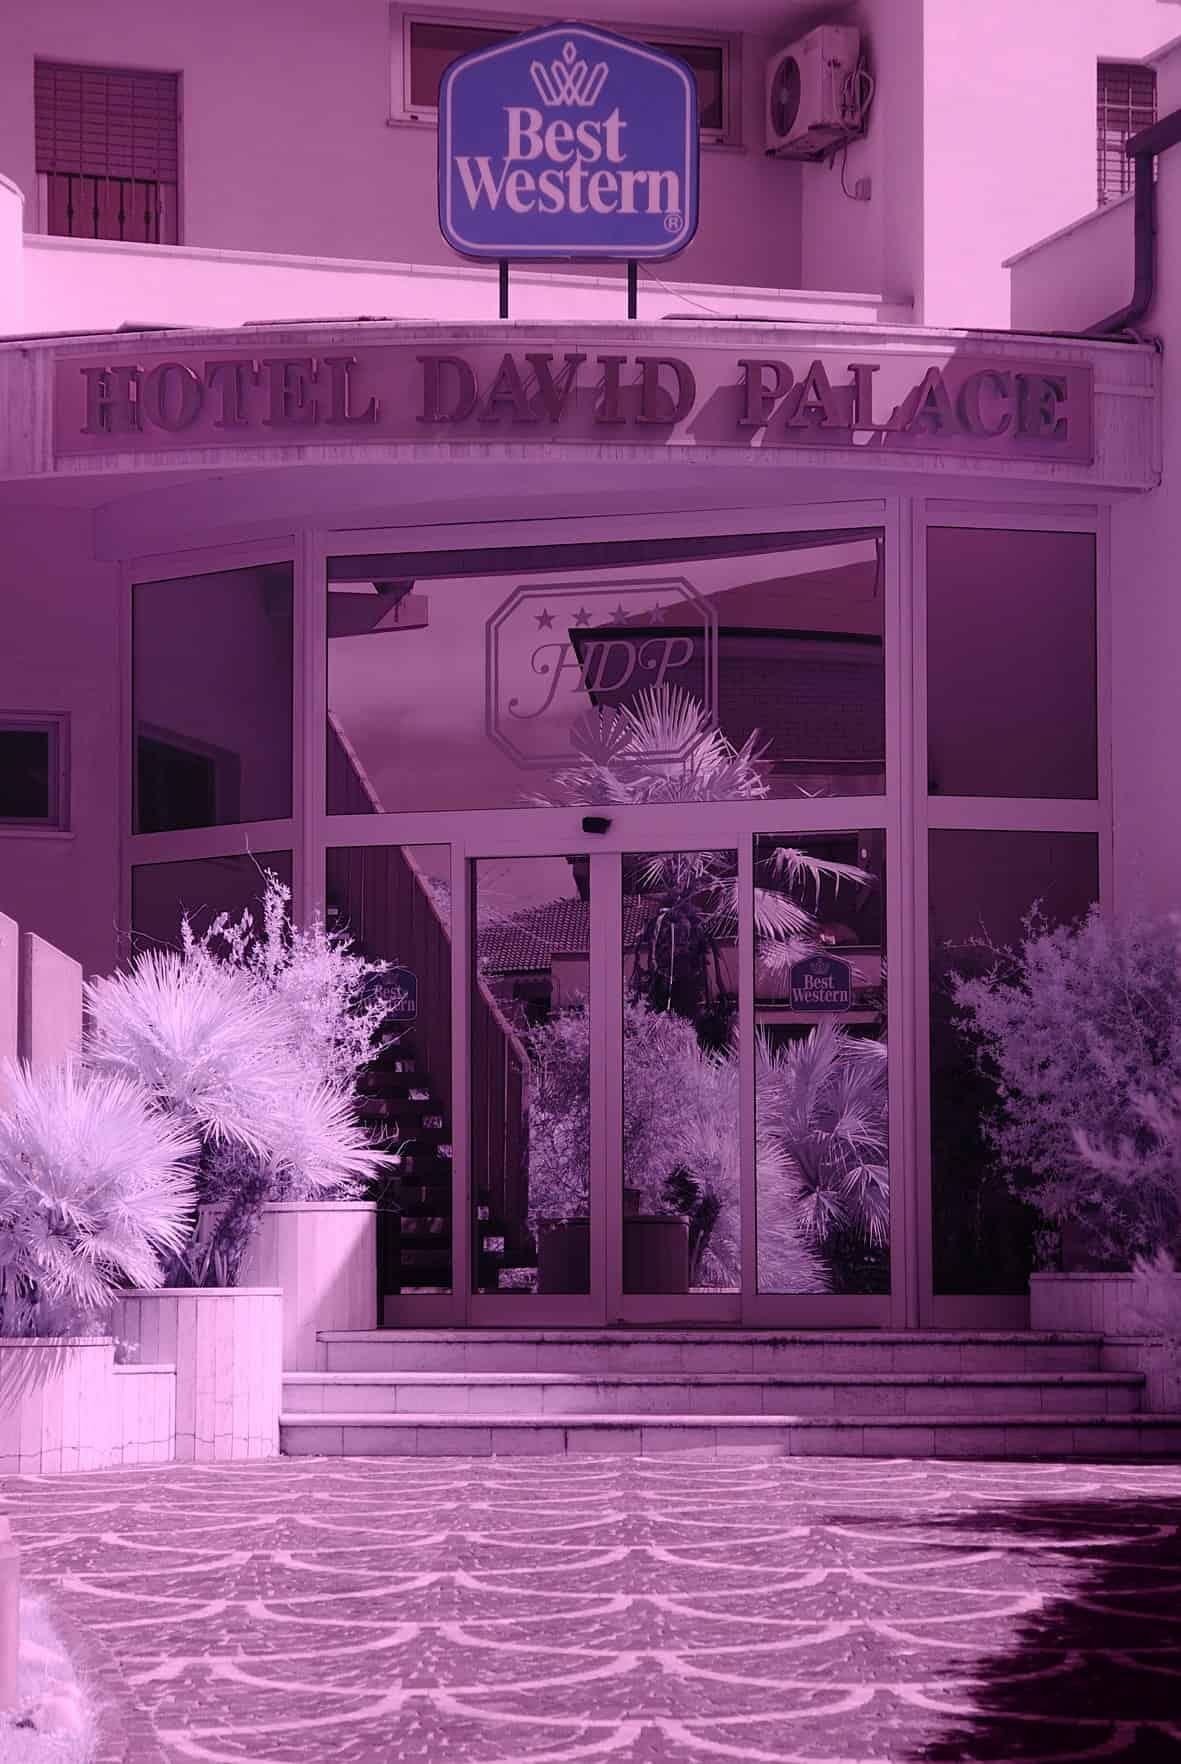 Hotel David Palace Porto San Giorgio c